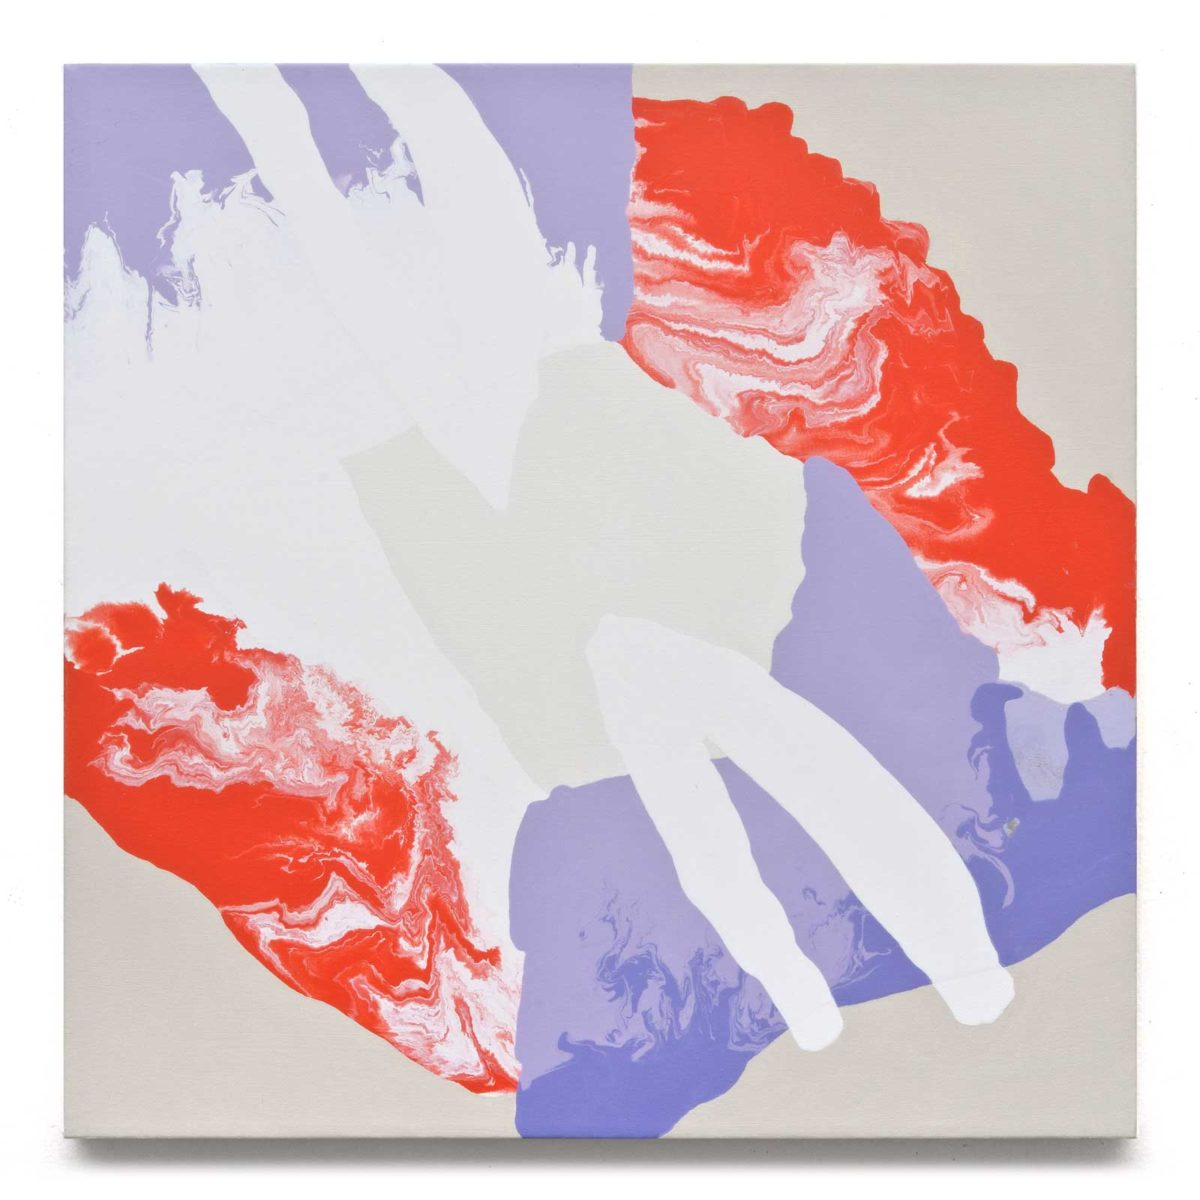 Ephemera-2-oil-on-canvas-60.96 cm x 60.96 cm.